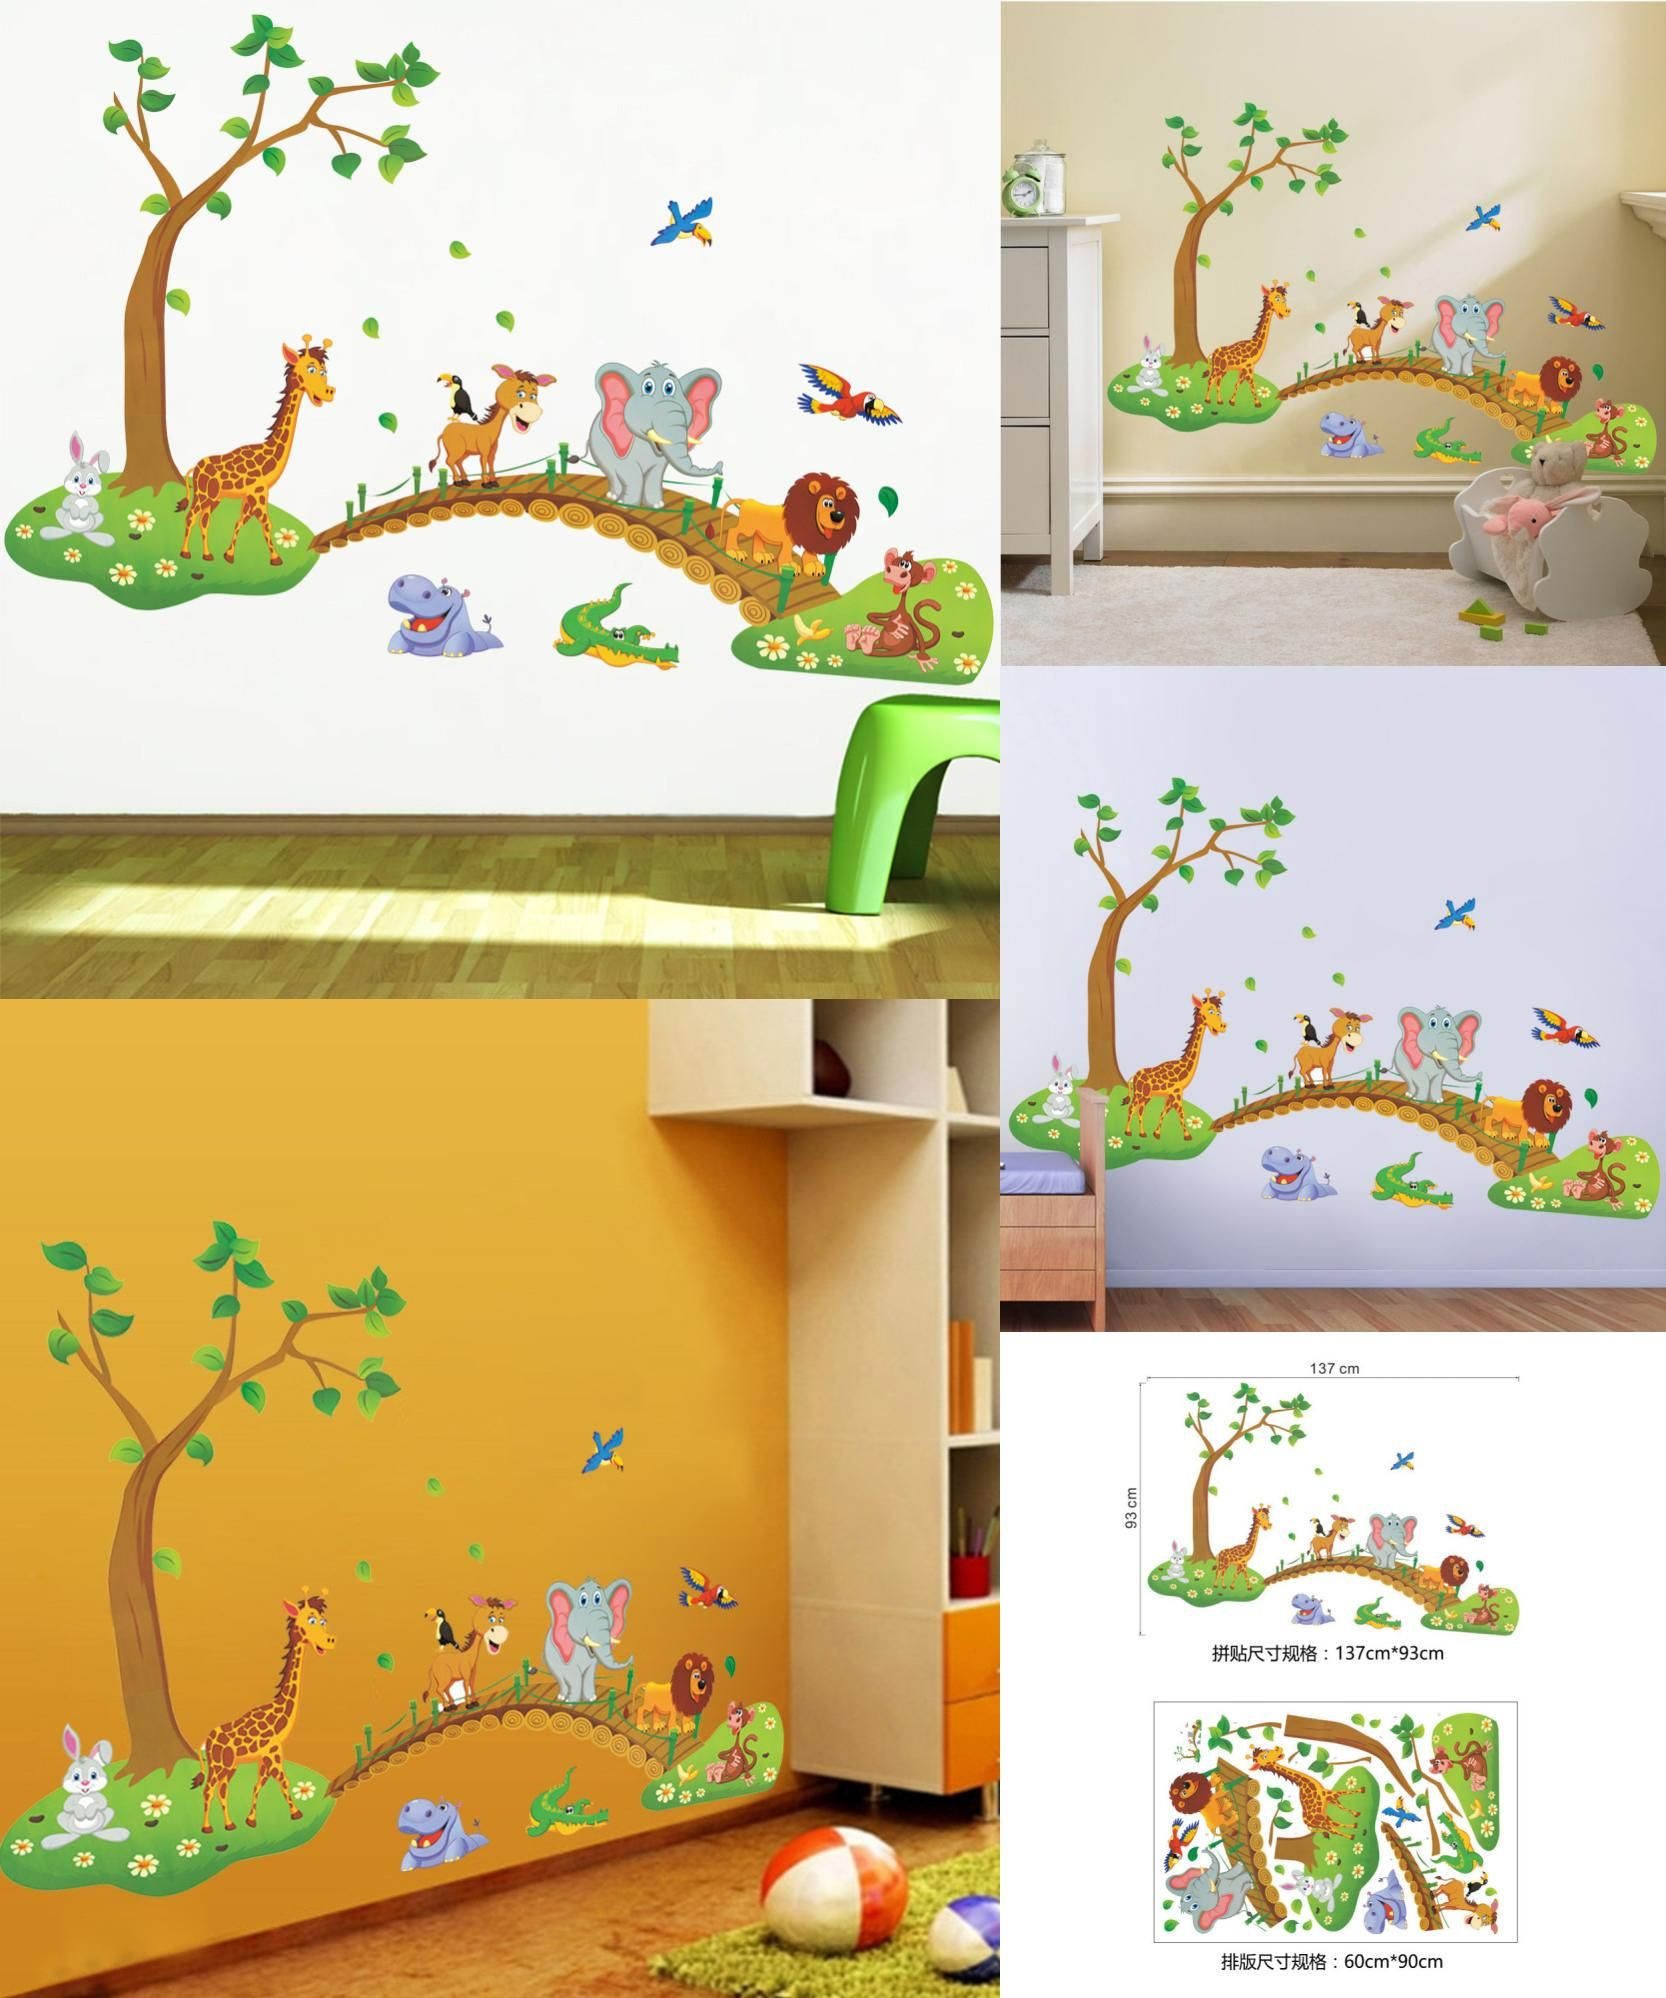 Visit to Buy] 3D Cartoon Jungle wild animal tree bridge lion Giraffe ...